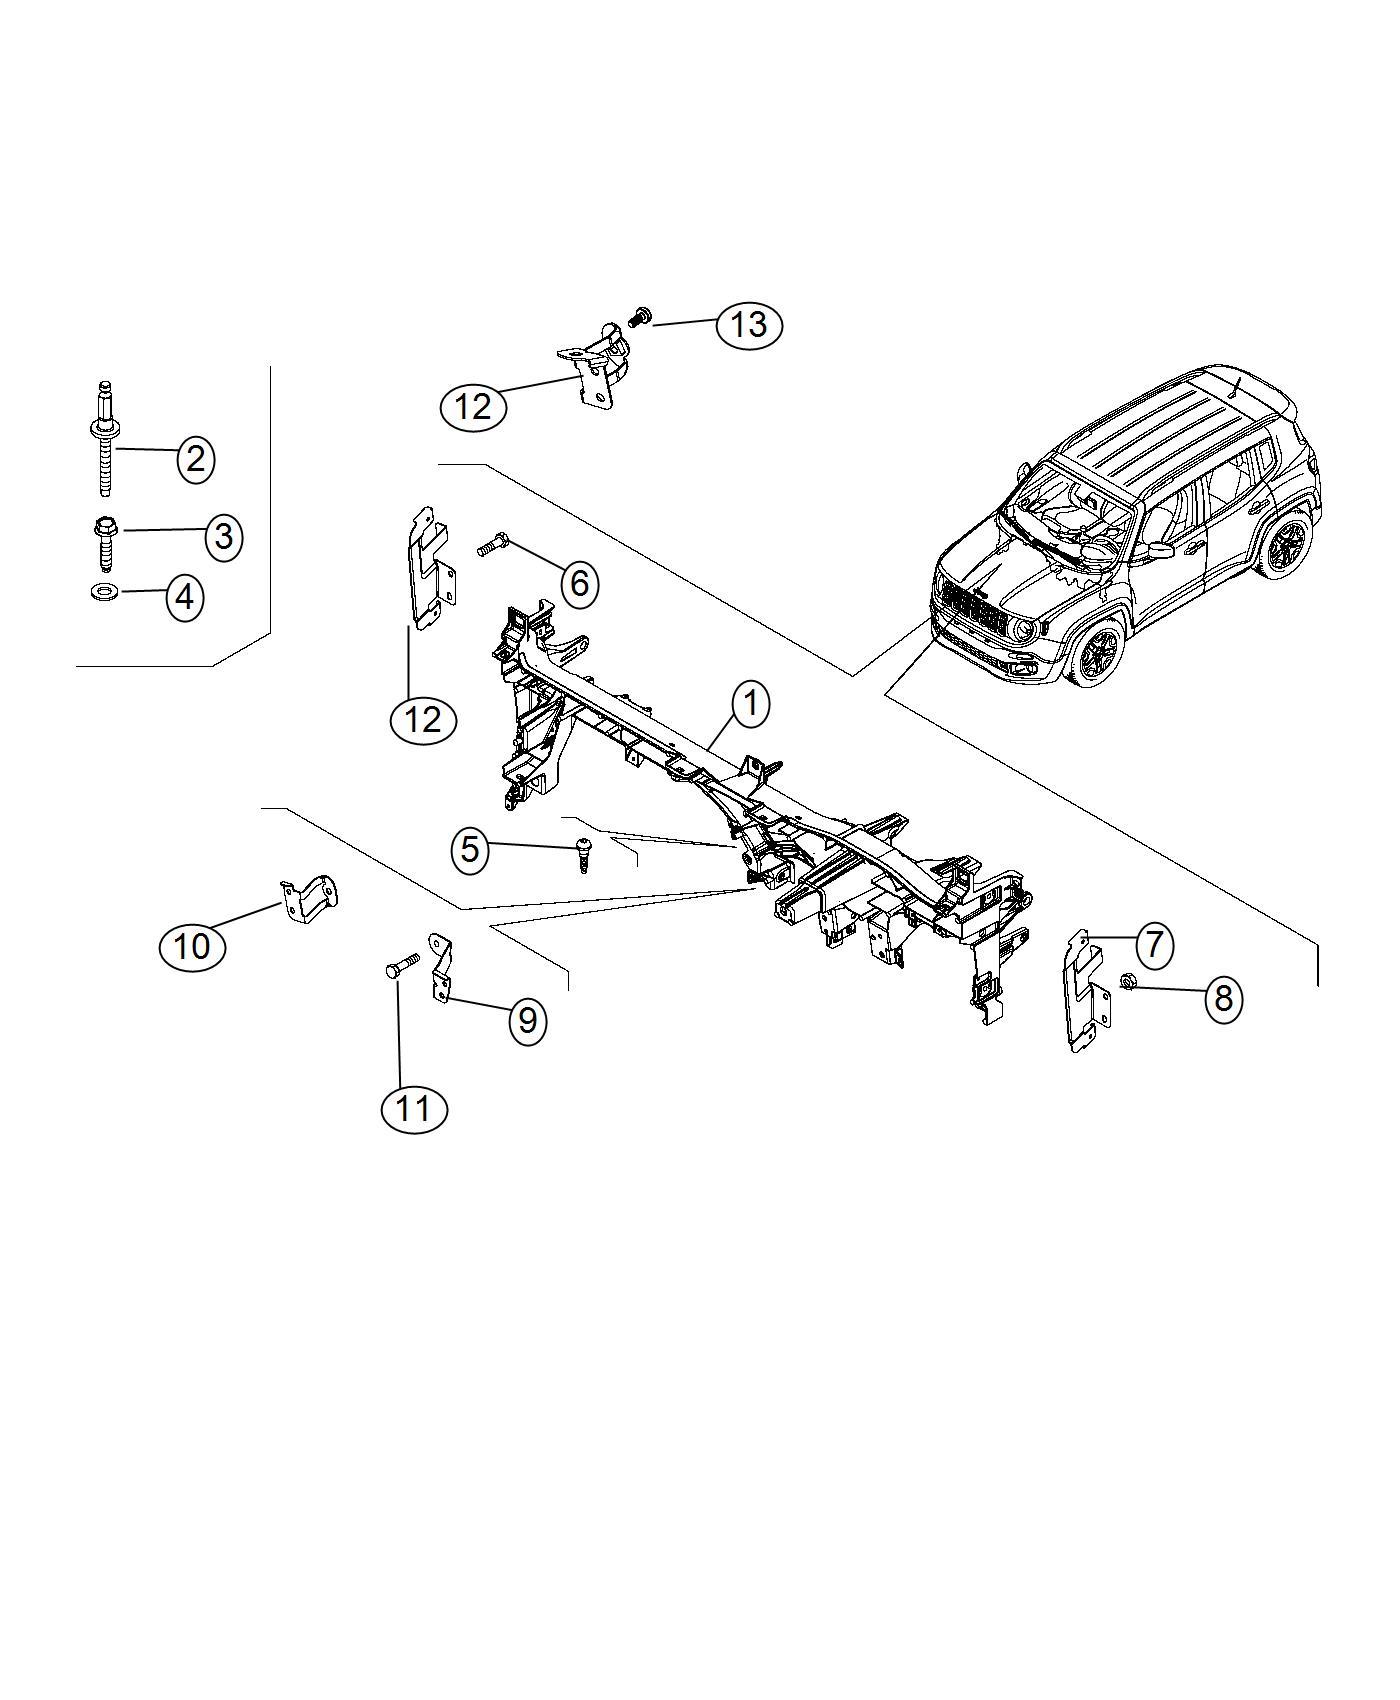 2017 Jeep Renegade Reinforcement. Instrument panel